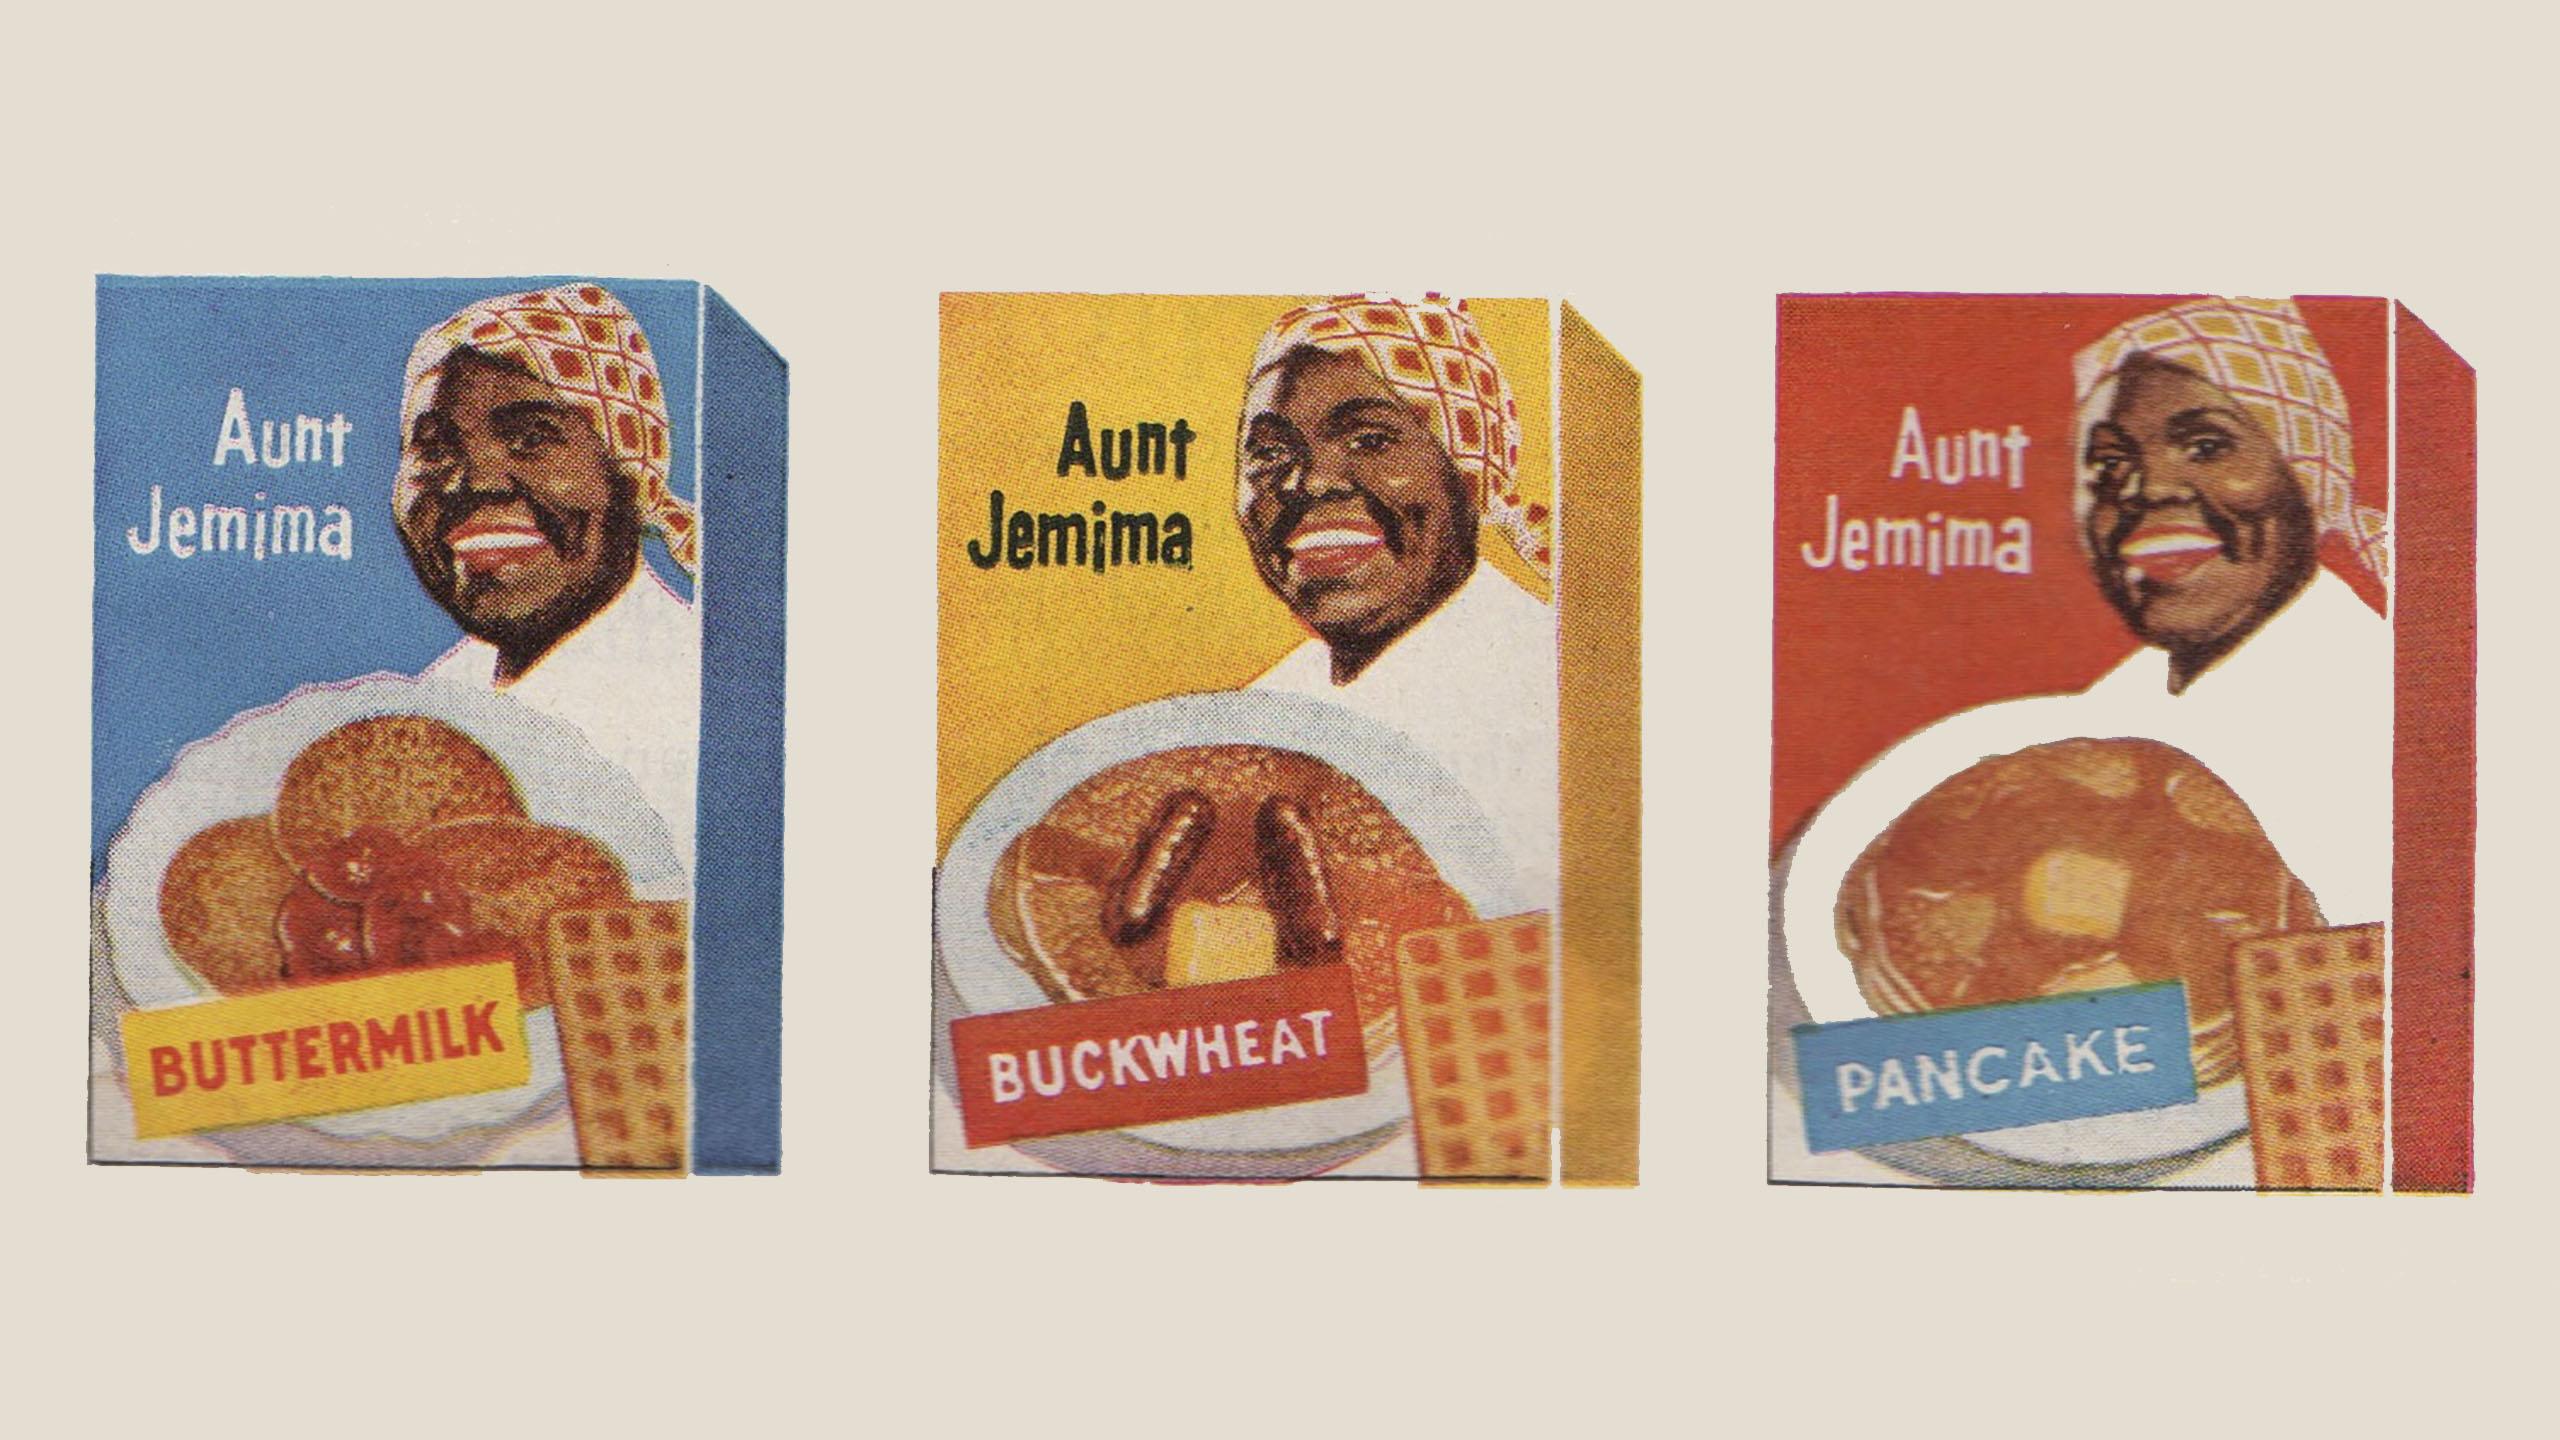 Aunt Jemima, hot cakes, Quaker Oats